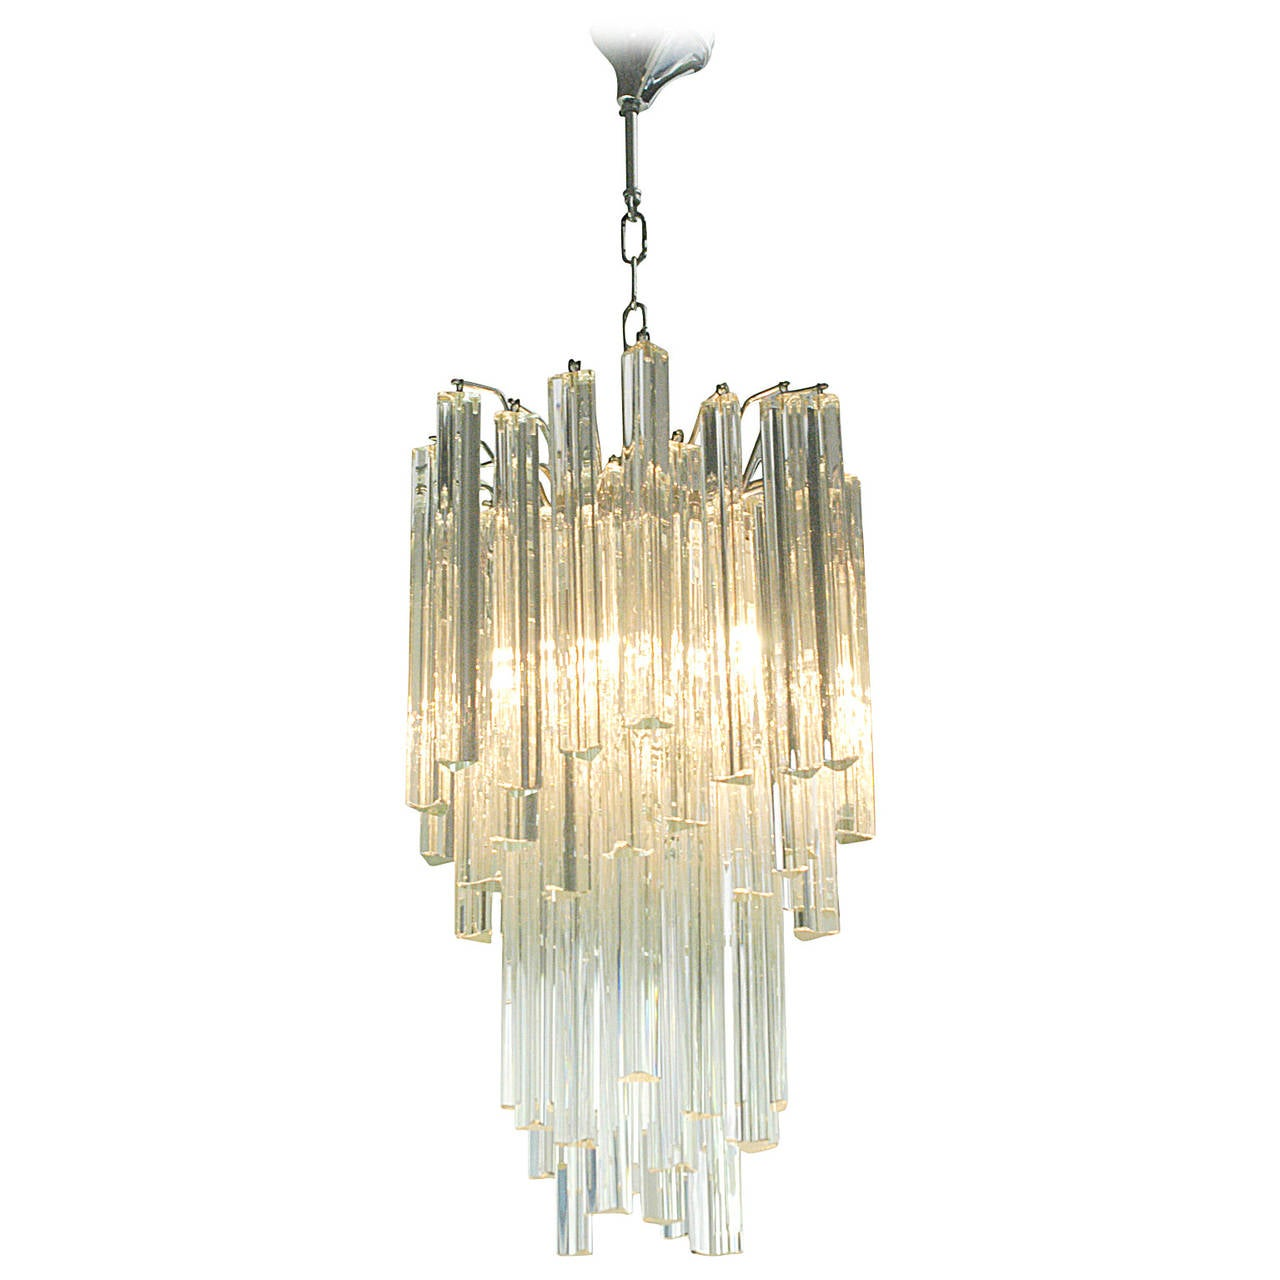 Venini triedi glass cascade chandelier at 1stdibs venini triedi glass cascade chandelier 1 arubaitofo Gallery